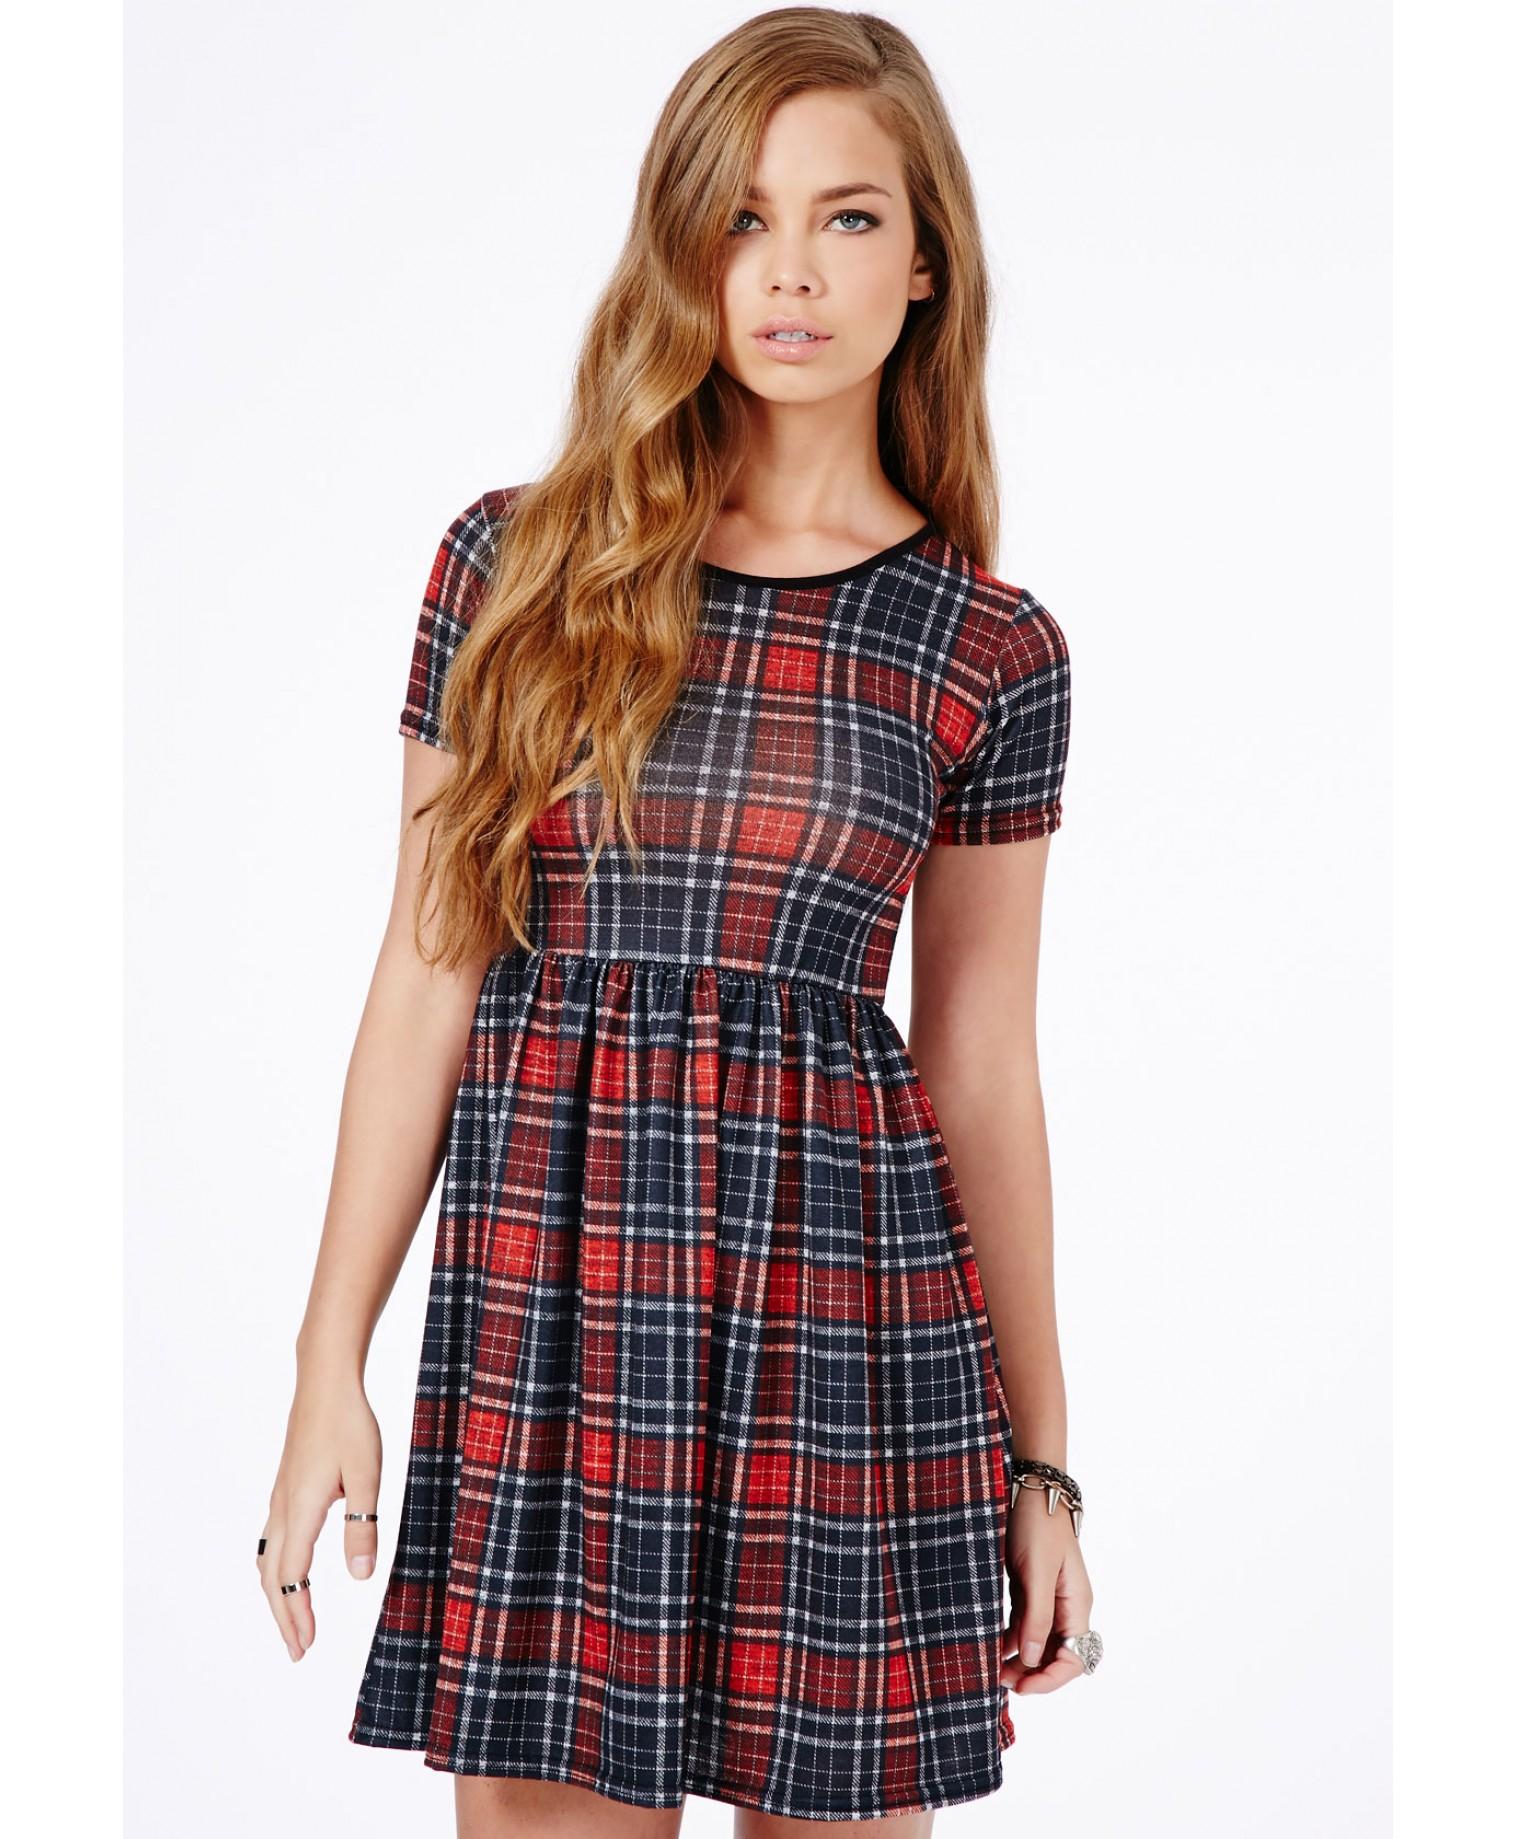 Lyst - Missguided Sevilla Tartan Skater Dress in Red 29a852b24